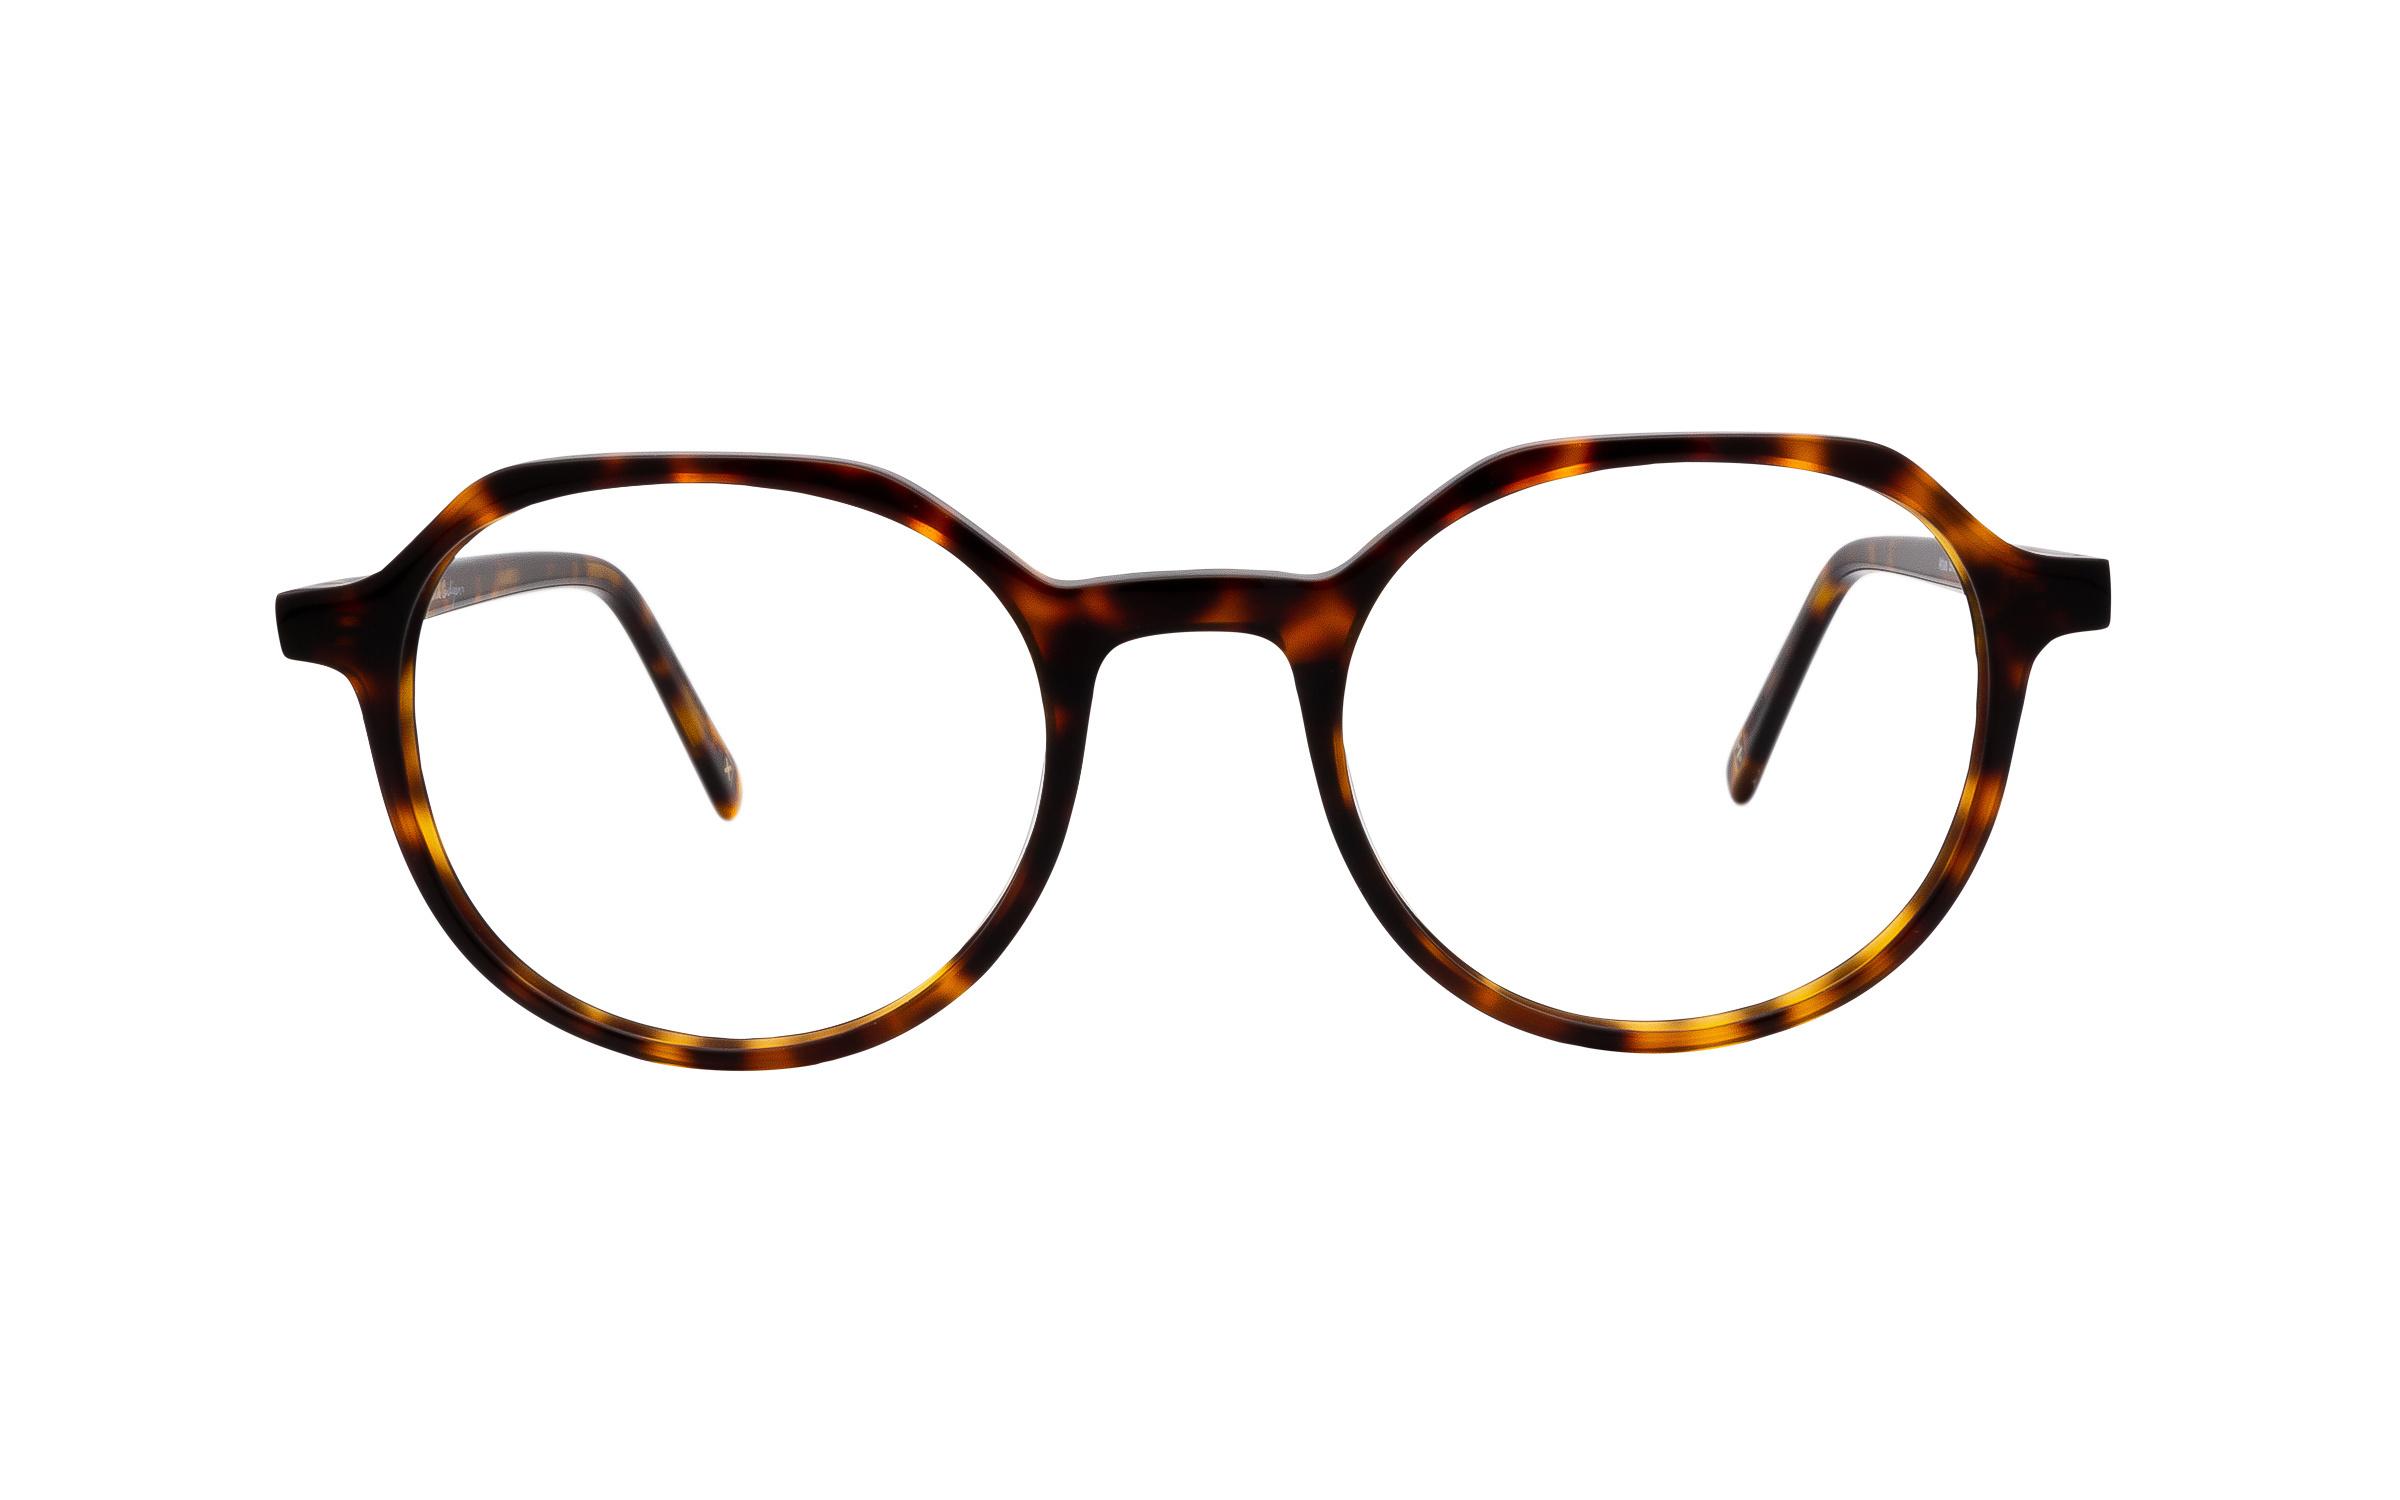 http://www.coastal.com/ - Derek Cardigan Atlas DC214 C01 (47) Eyeglasses and Frame in Shiny Havana Tortoise – Online Coastal